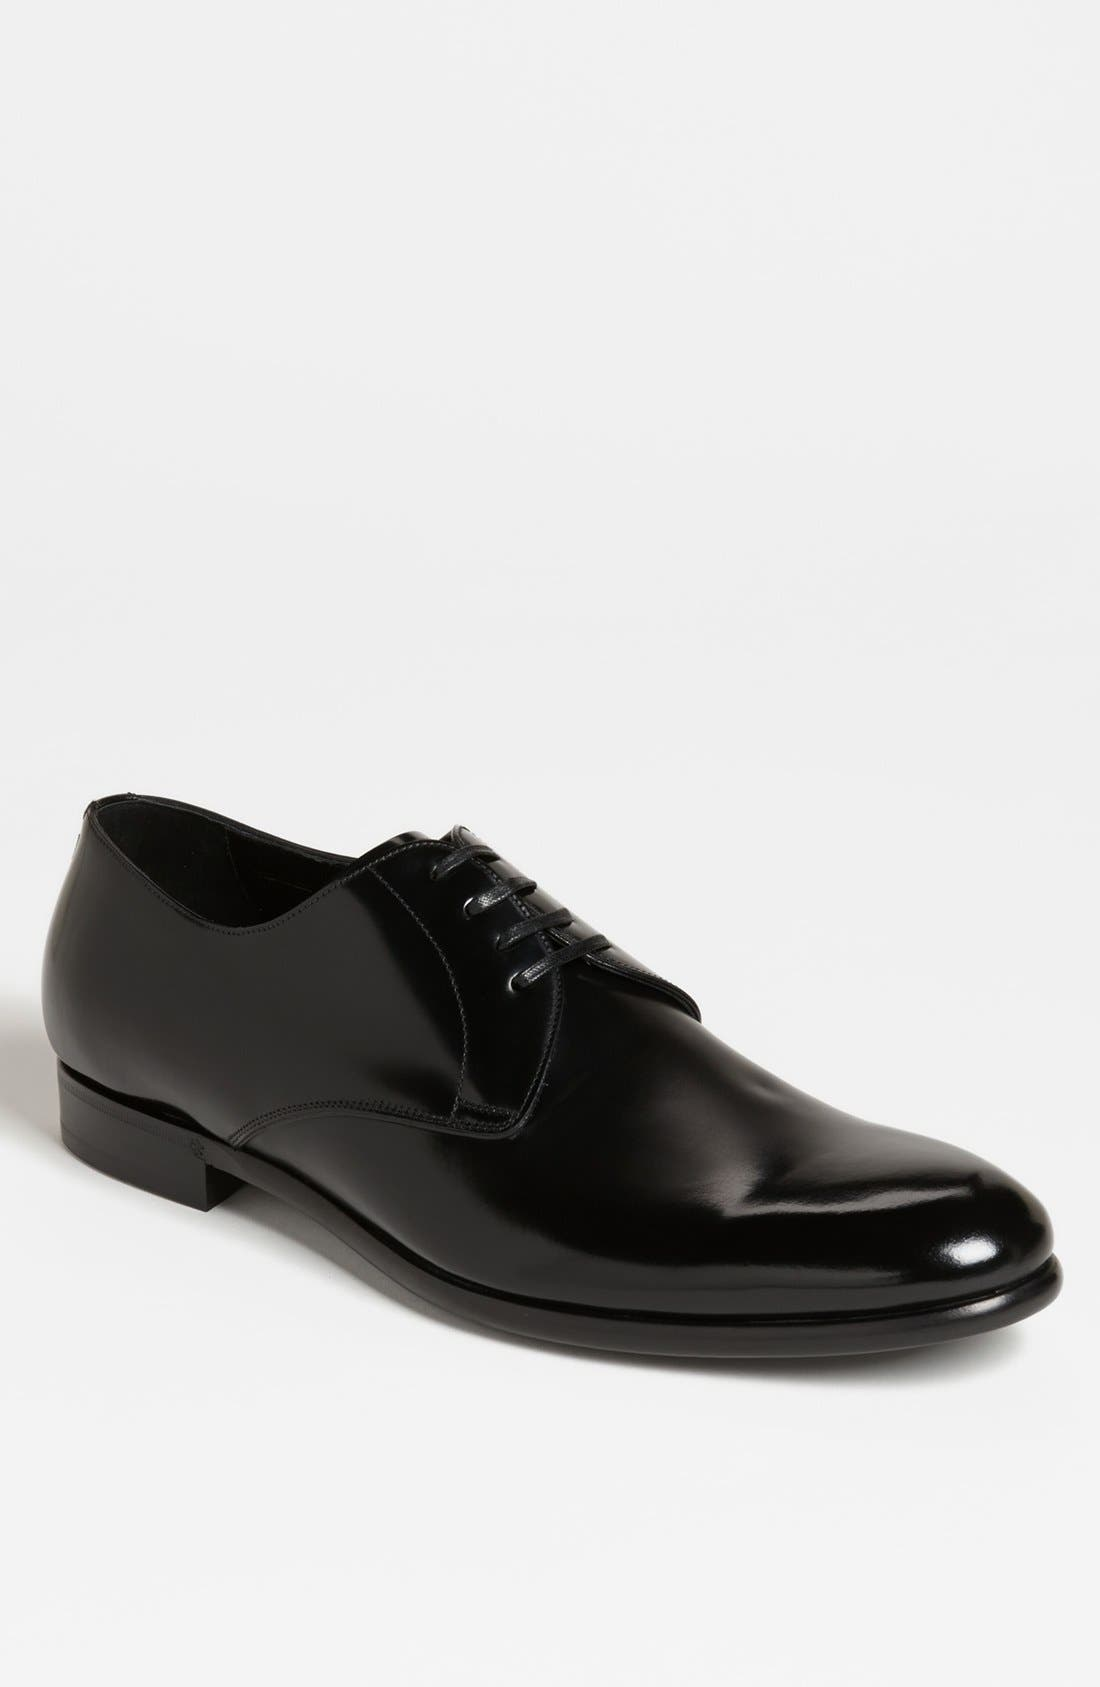 Alternate Image 1 Selected - Dolce&Gabbana 'Napoli' Plain Toe Derby